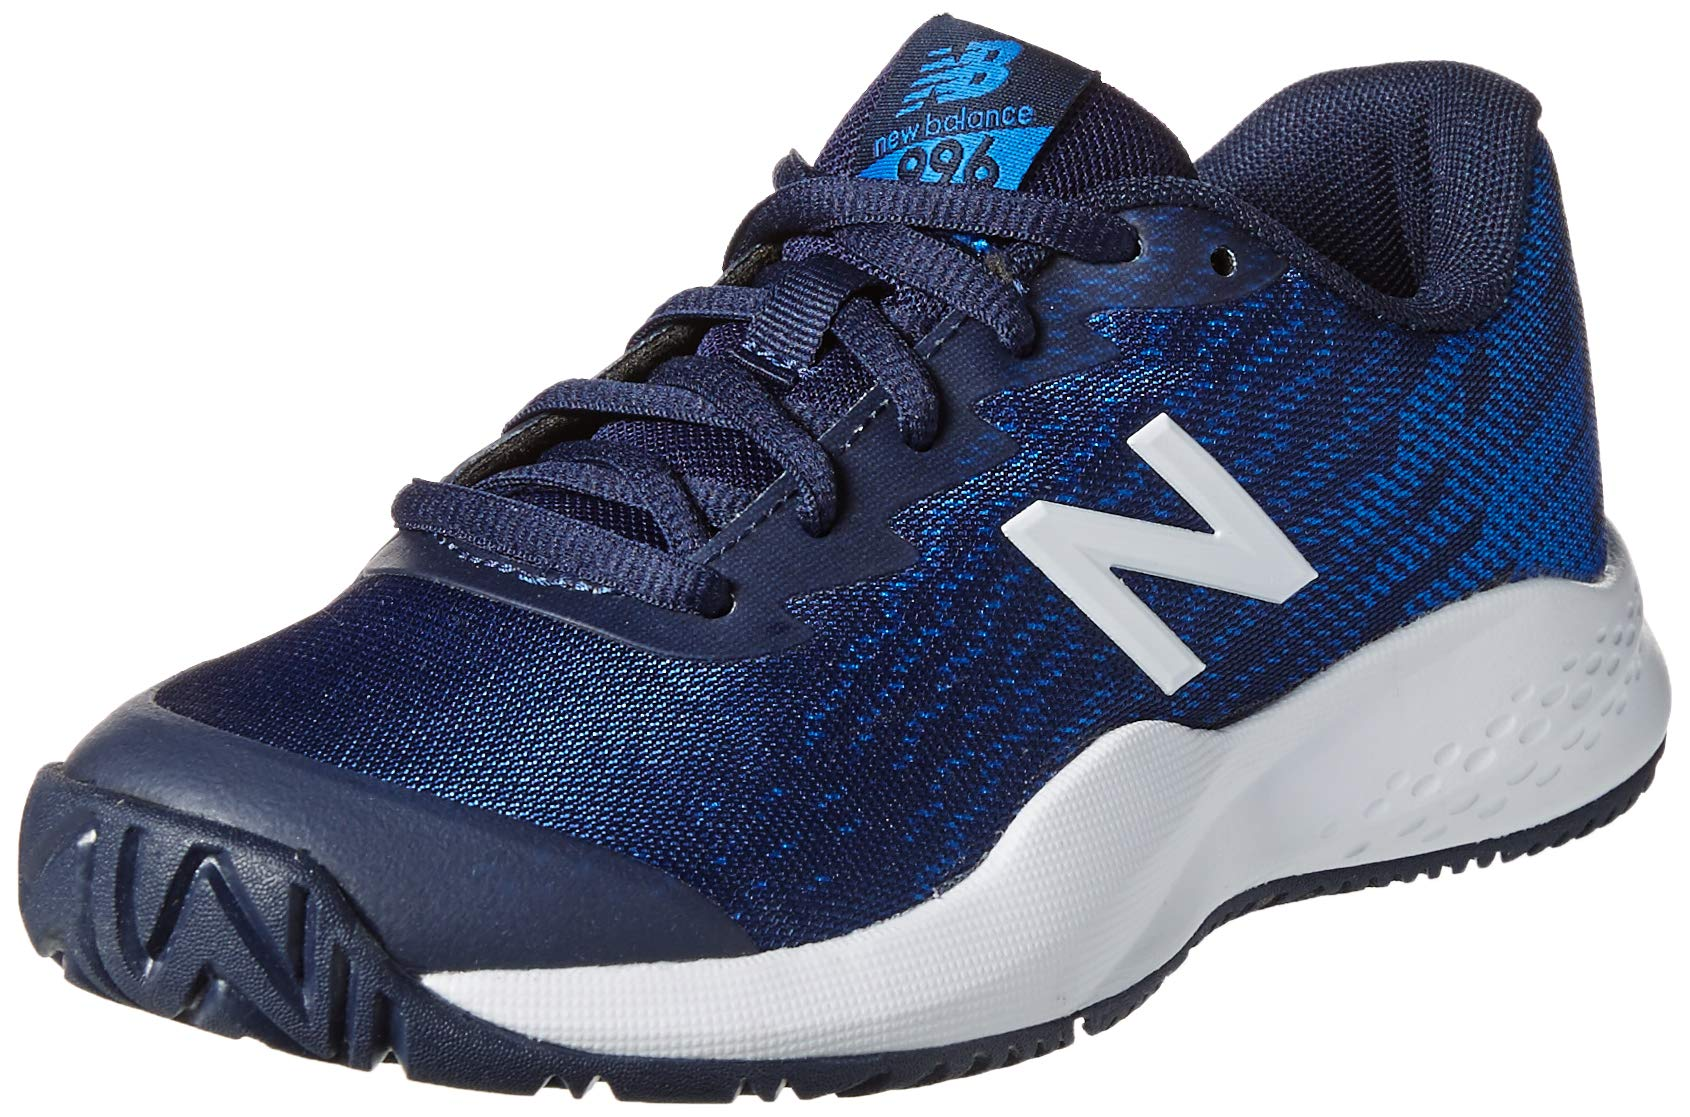 New Balance Boys' Kid's 996v3 Hard Court Running Shoe, Pigment Blue, 13.5 W US Little